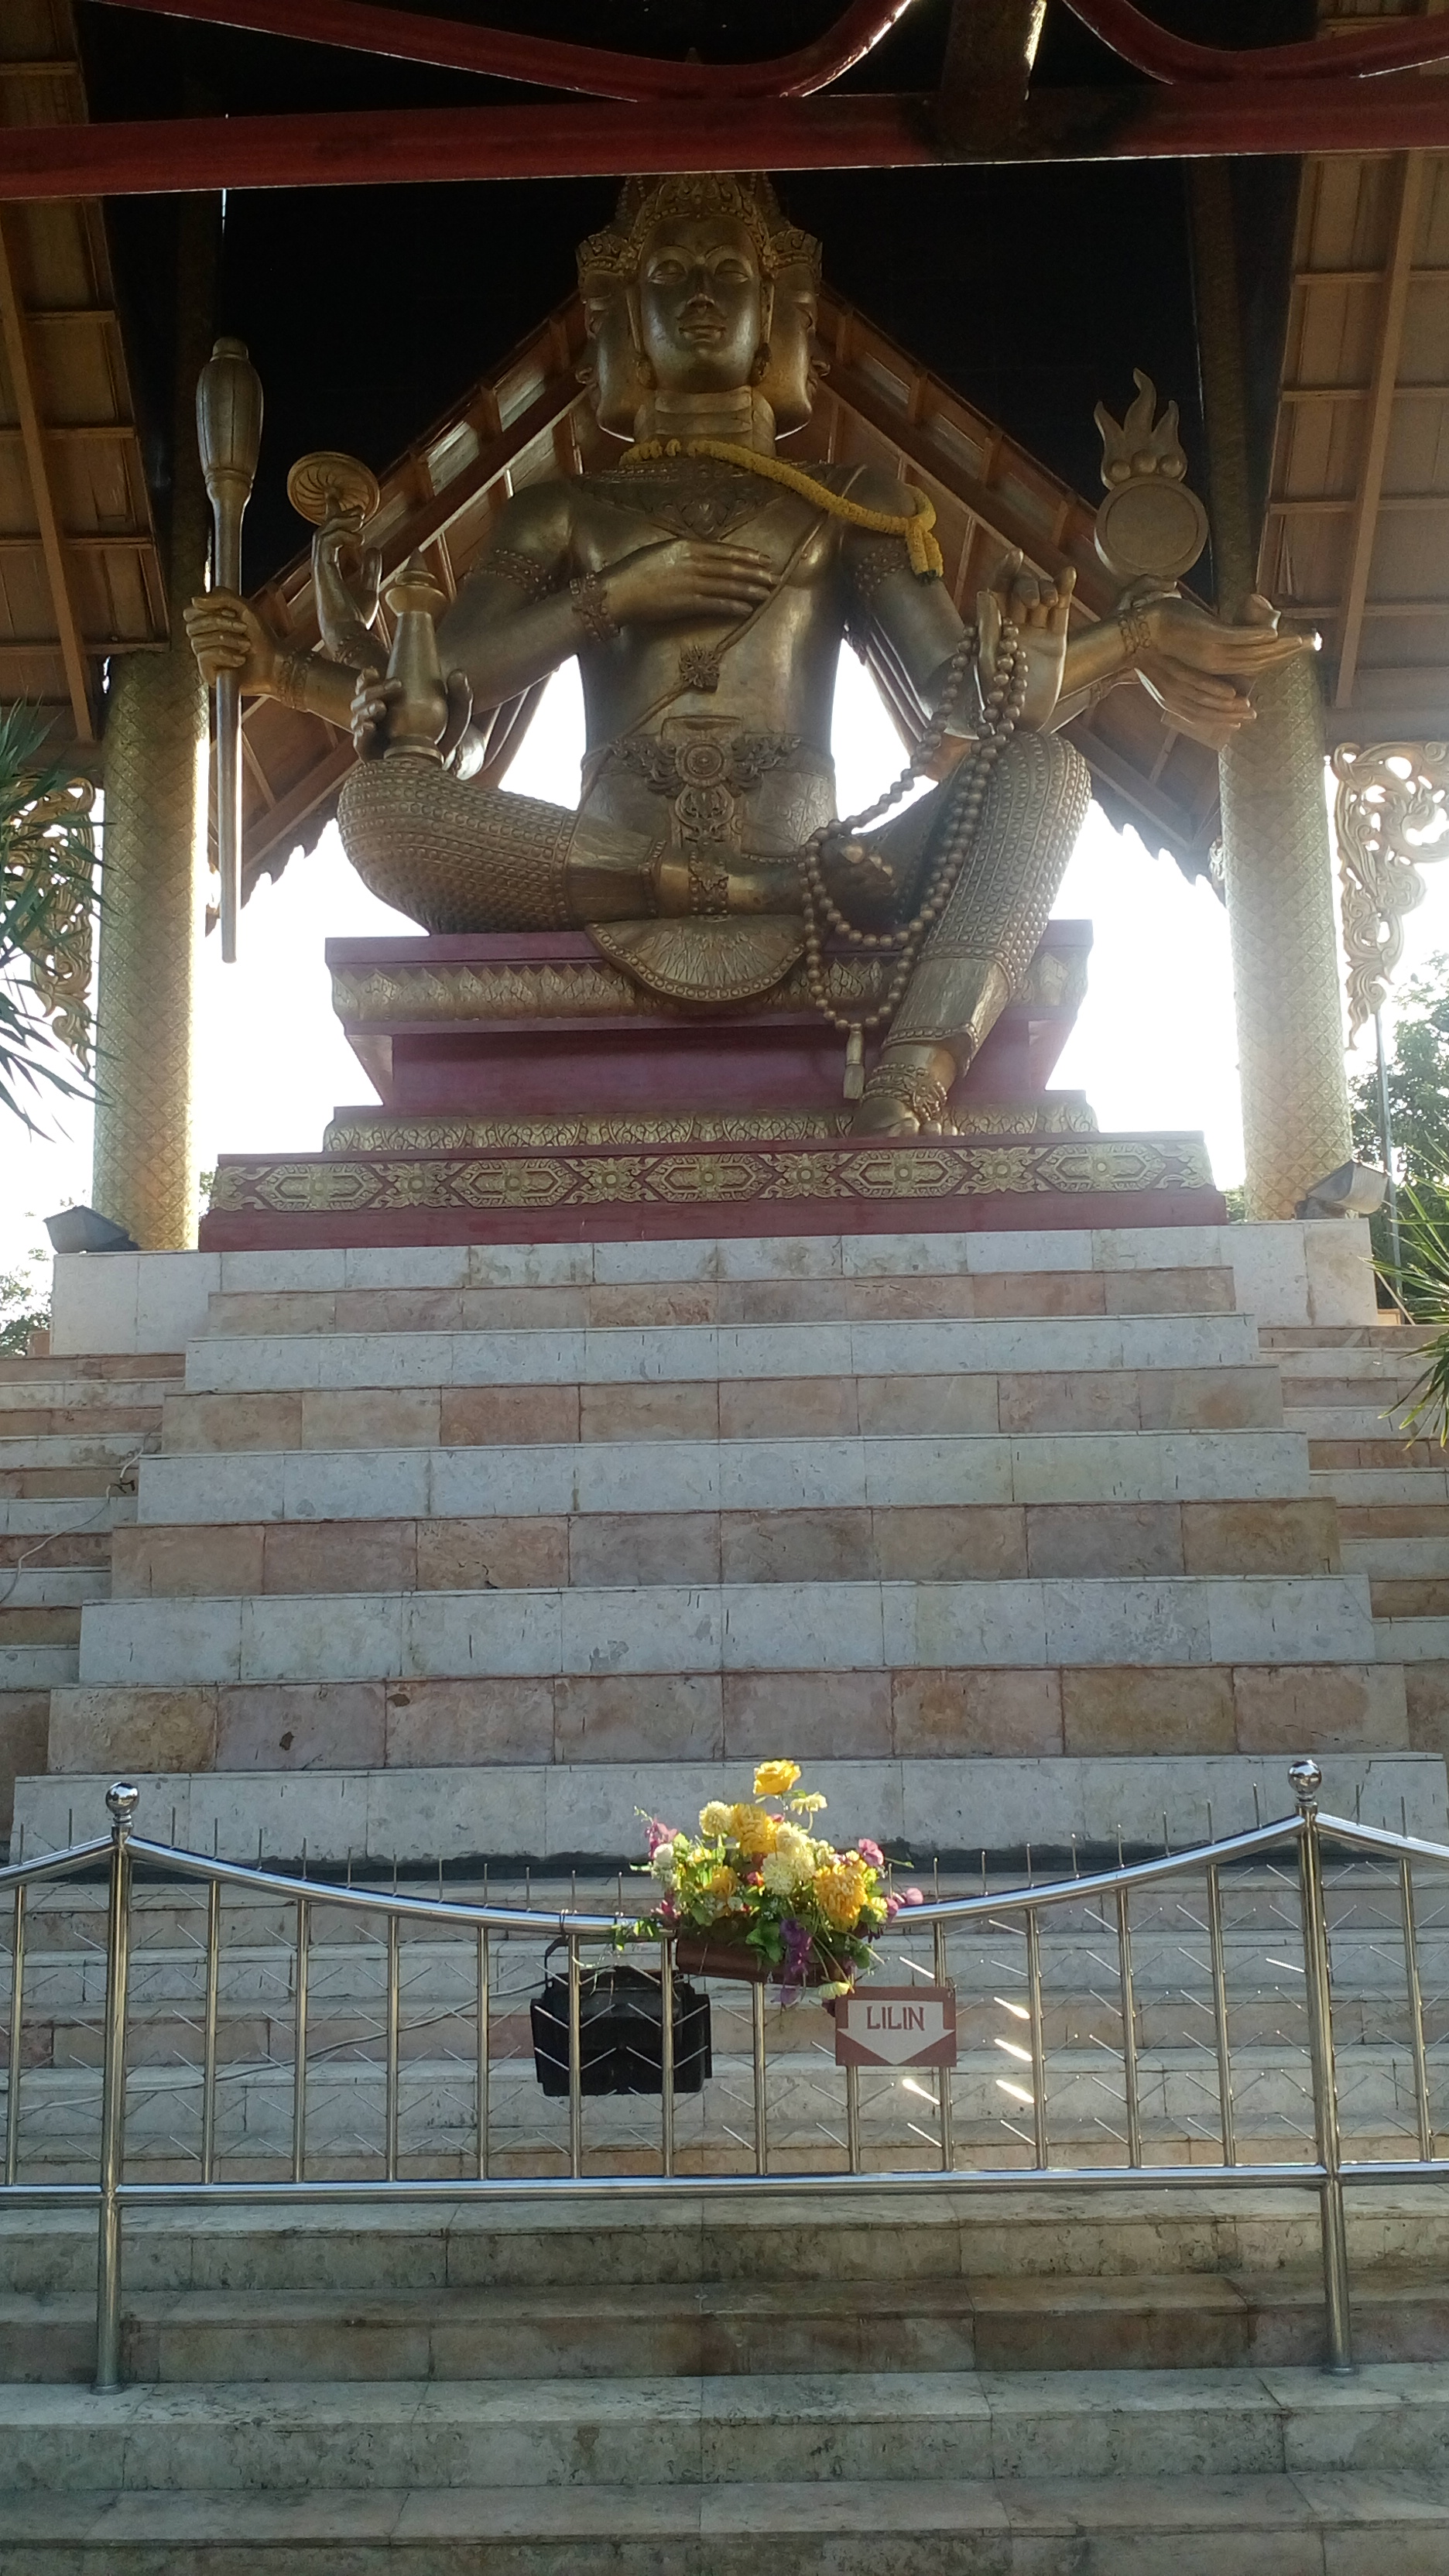 Patung Budha Empat Wajah Tertinggi Indonesia Image Memiliki Wisata Buddha